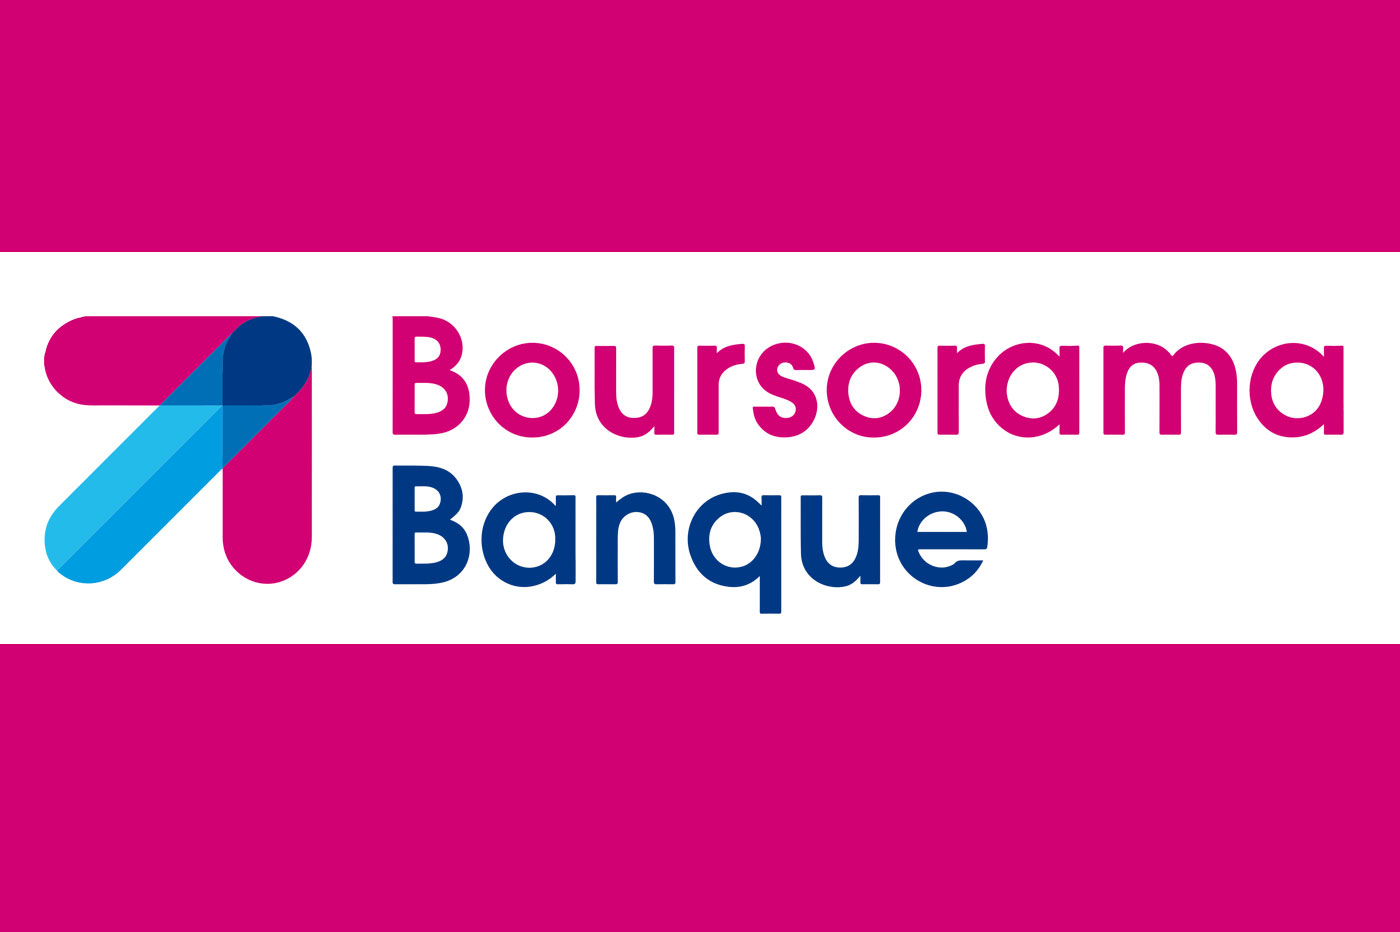 comment contacter boursorama banque